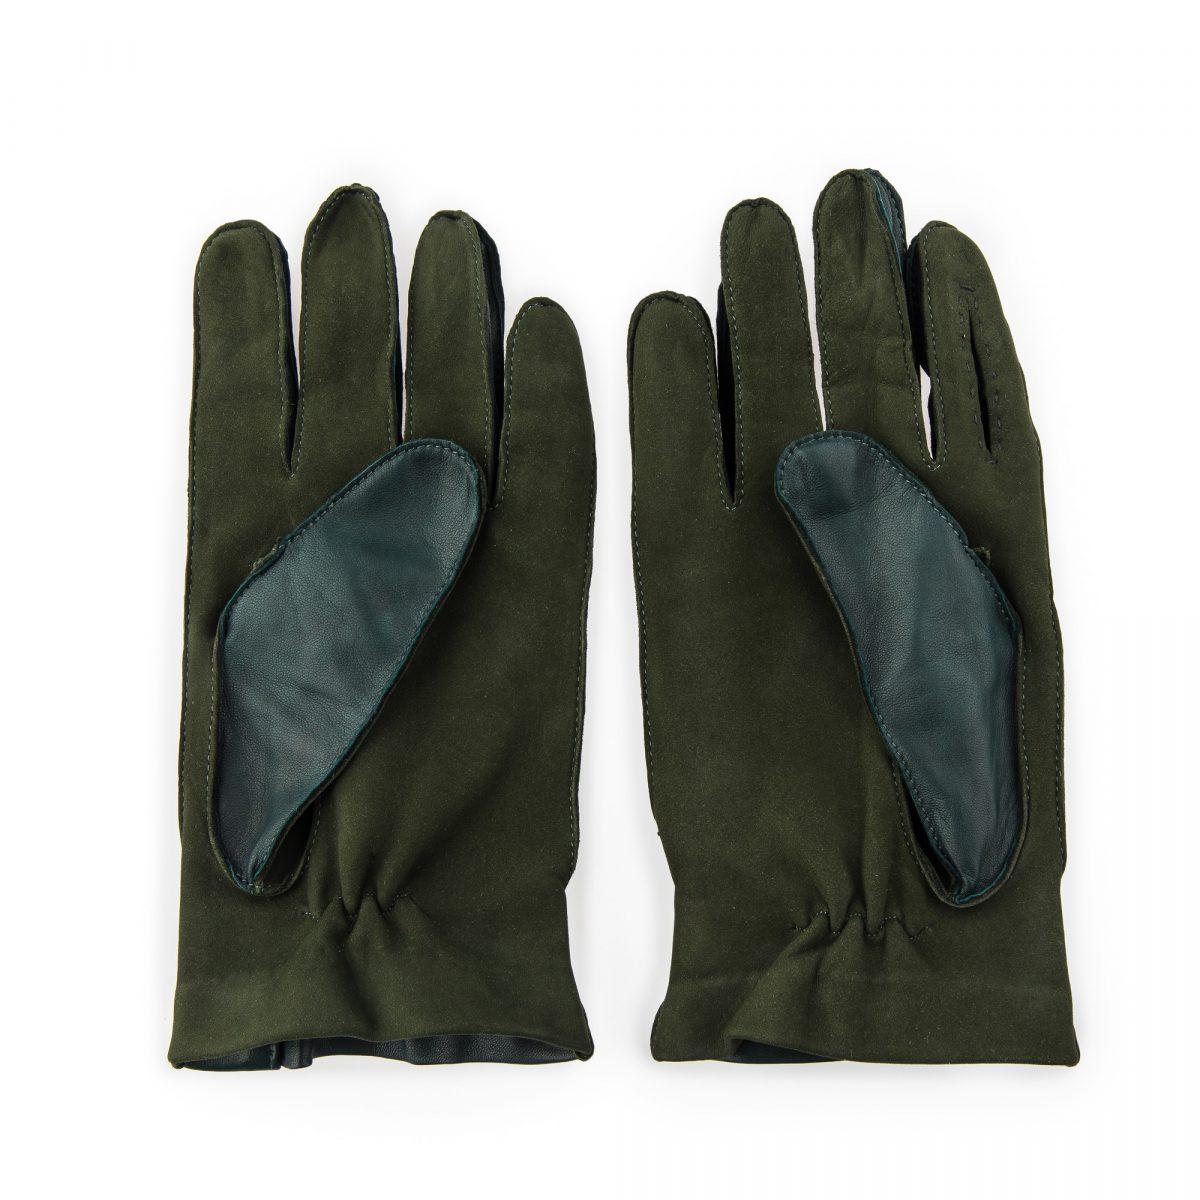 wr_co_premium_shooting_gloves-157-edit